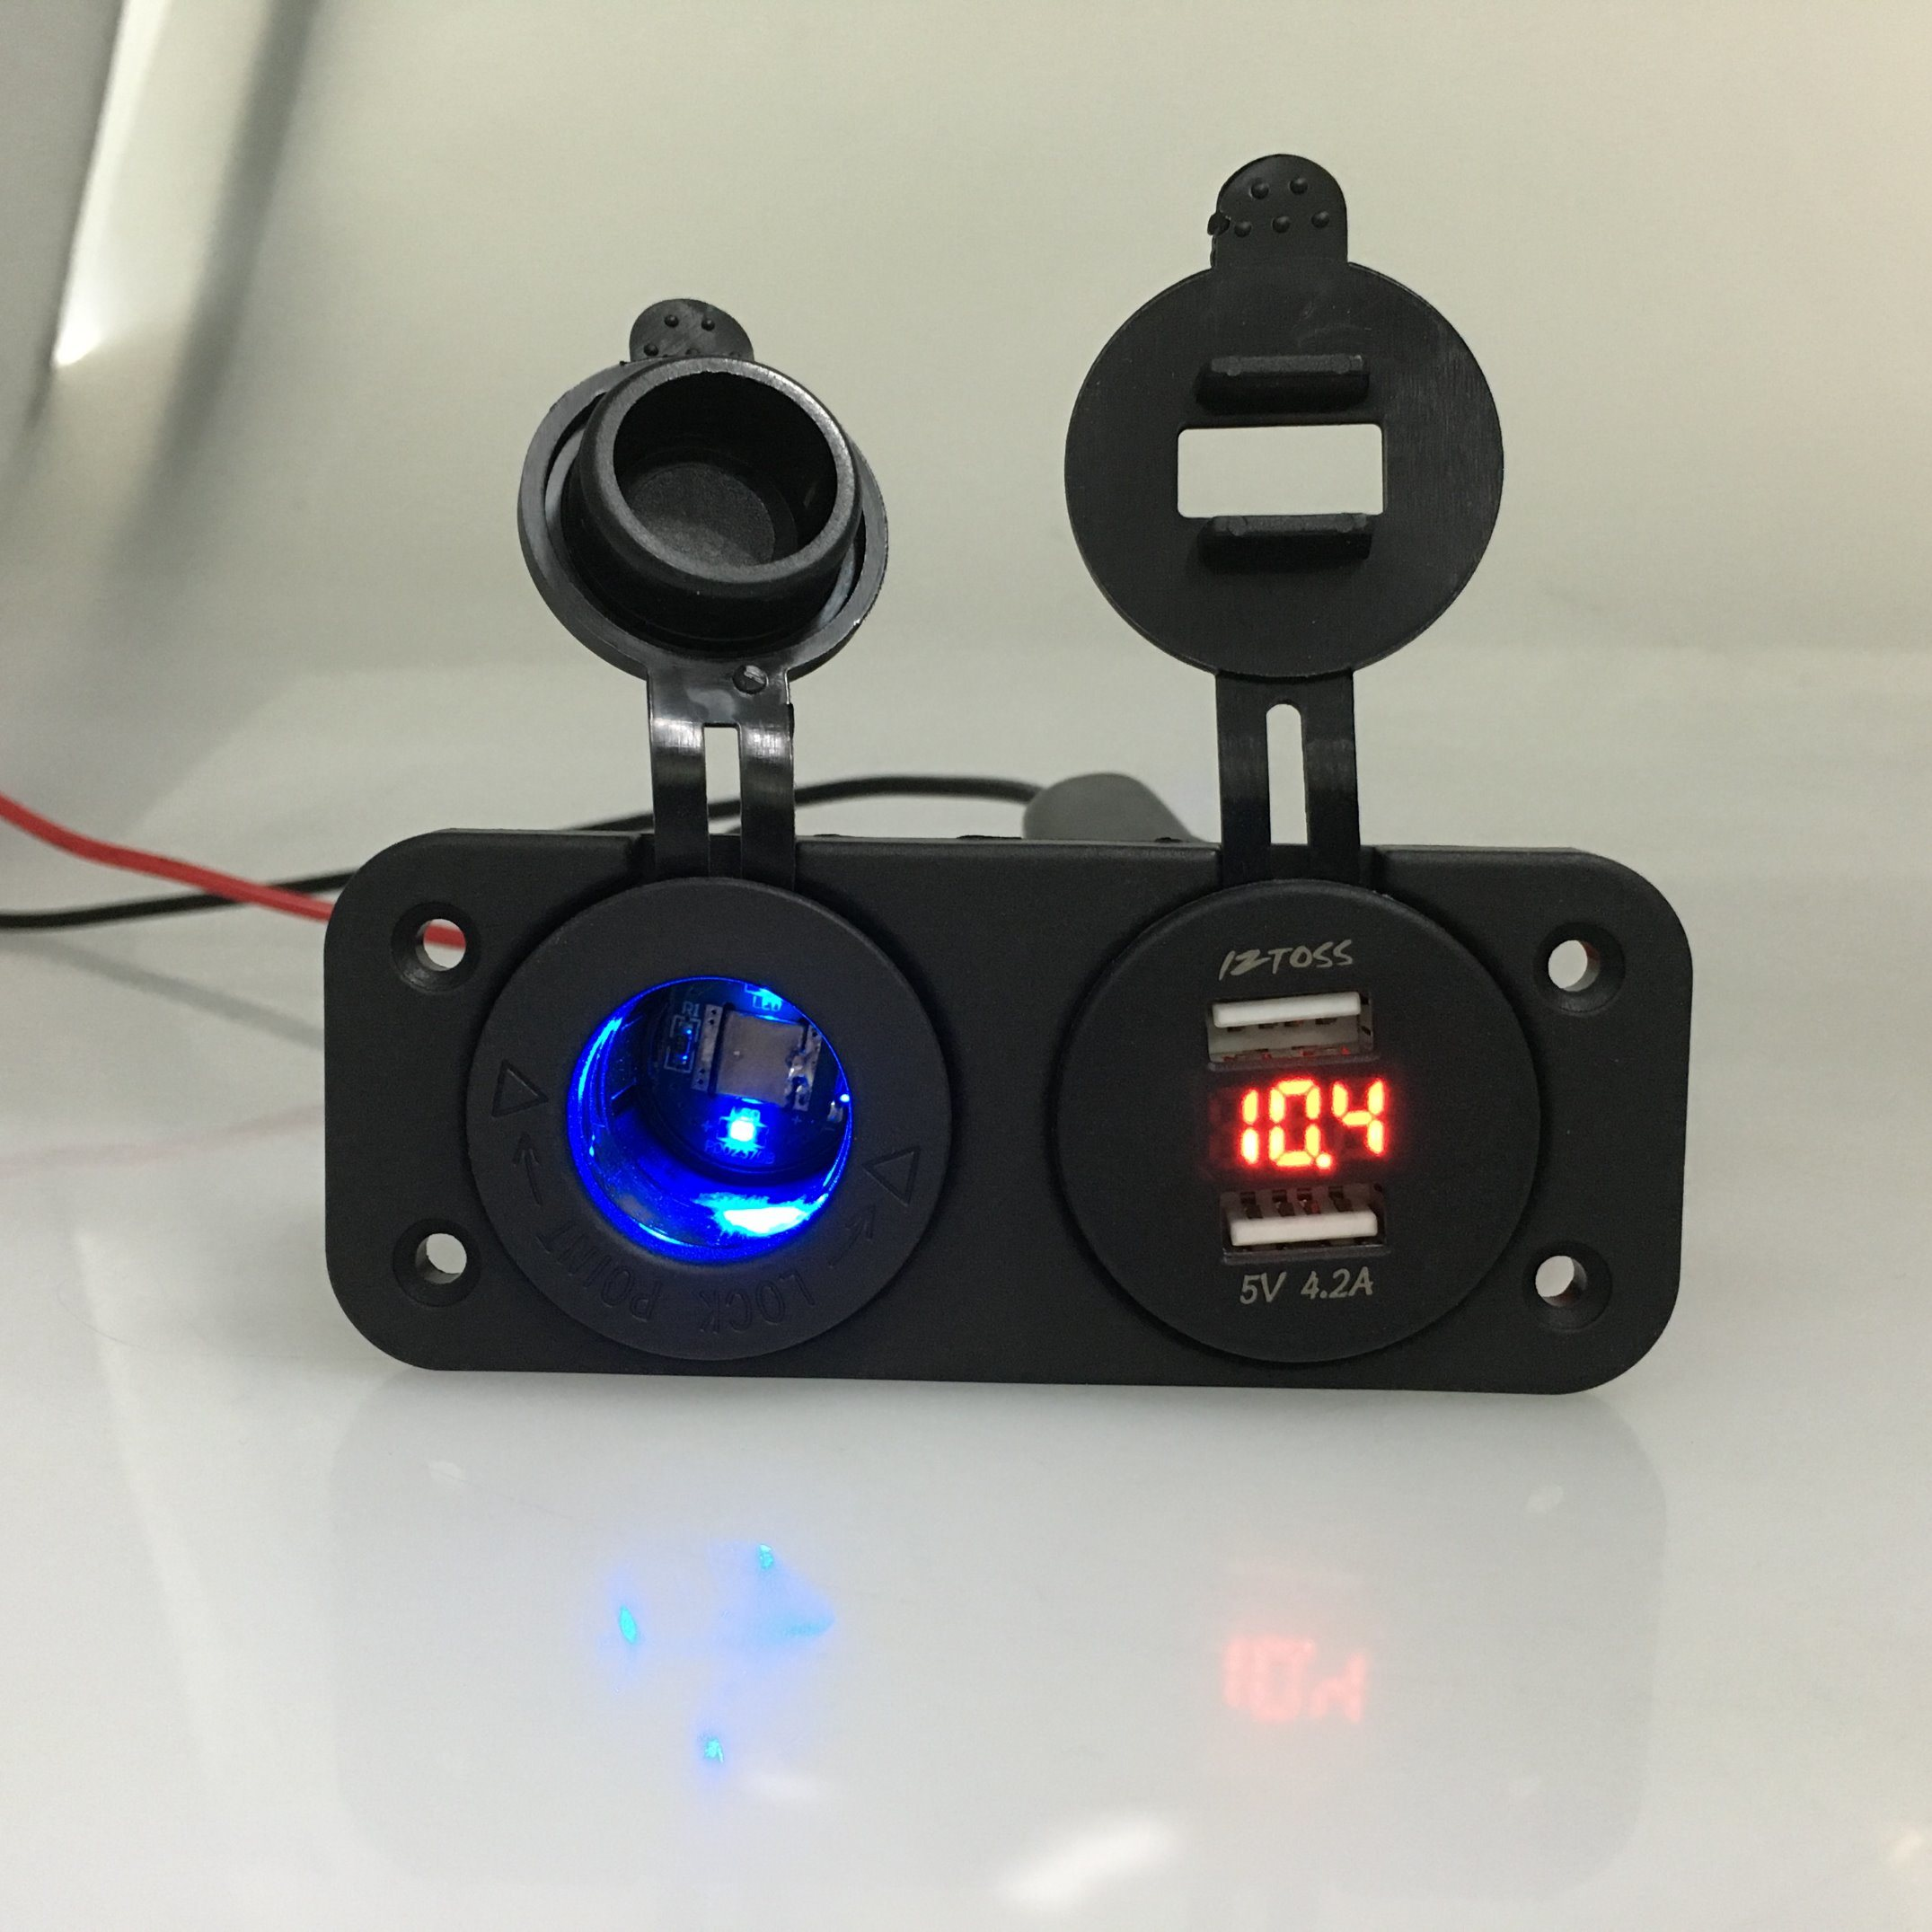 Motorbike Marine Dual USB Voltmeter Power Socket Plug Charger